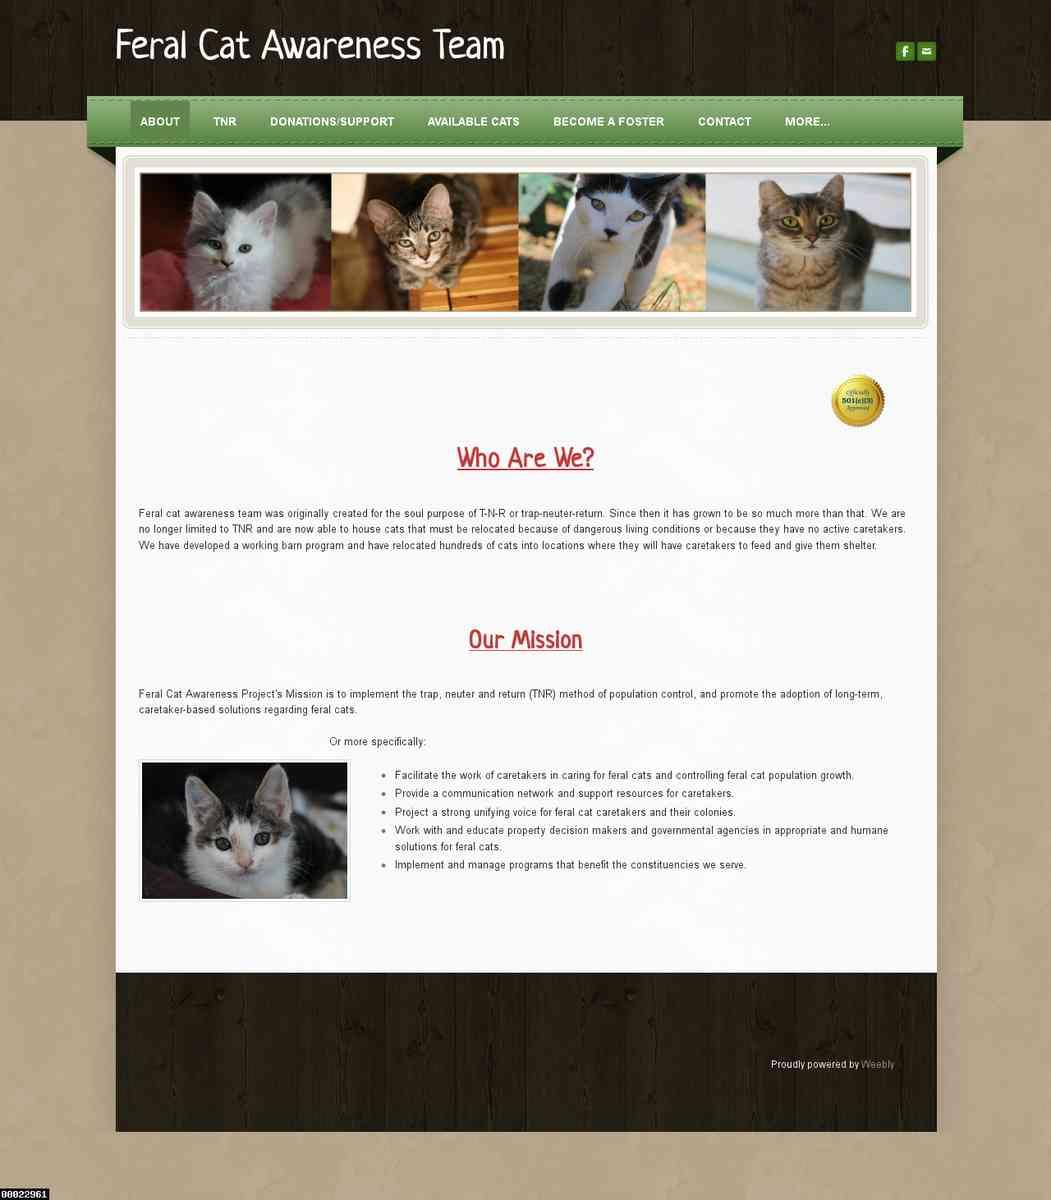 Feral Cat Awareness Team